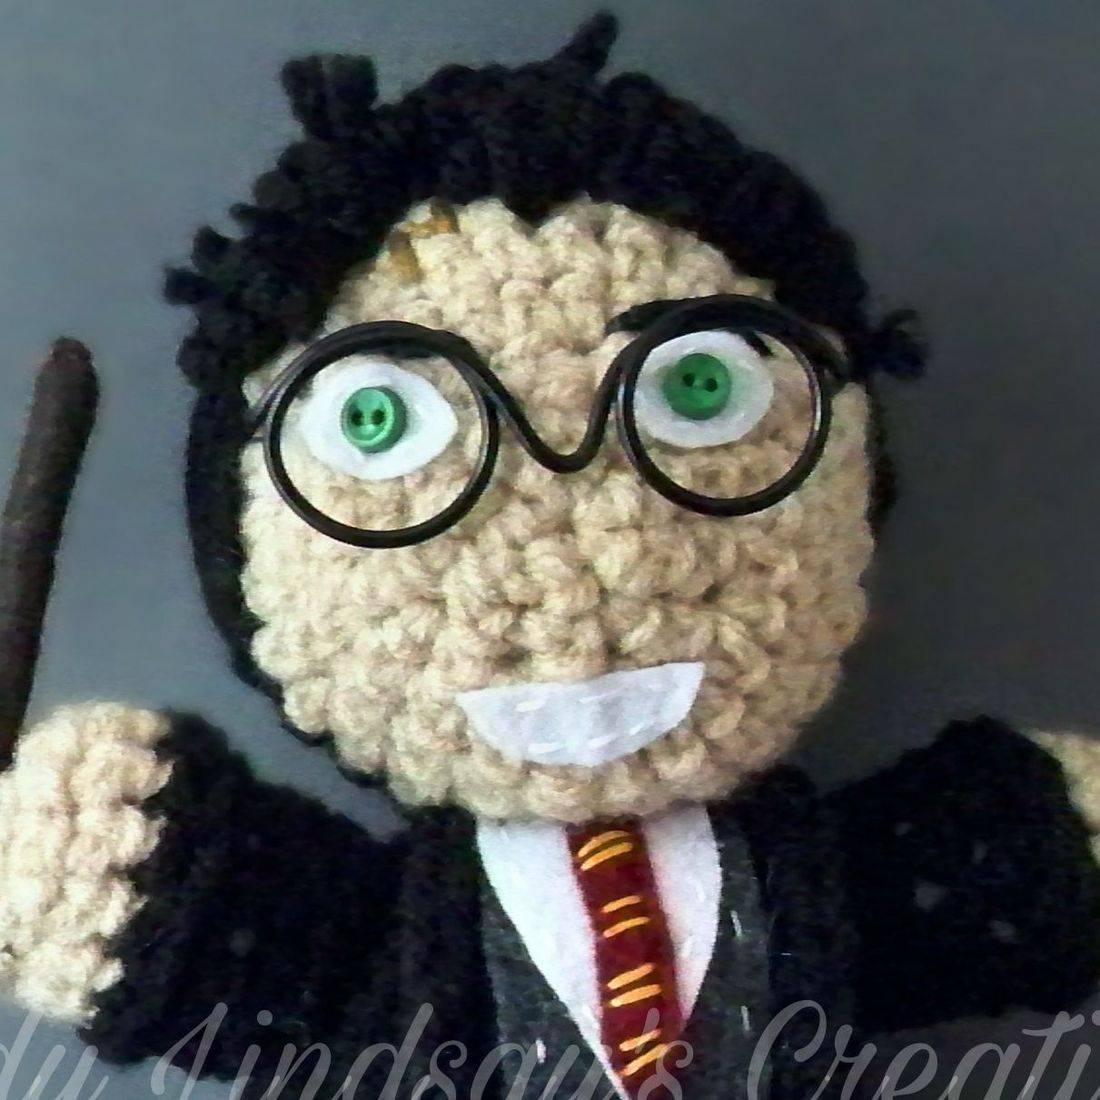 Harry Potter, Potterverse, Potterhead, Amigurumi, fantasy, wizard, magic, the boy who lived, comicbooks, videogames, handmade, crochet, plush, doll, Shop Small